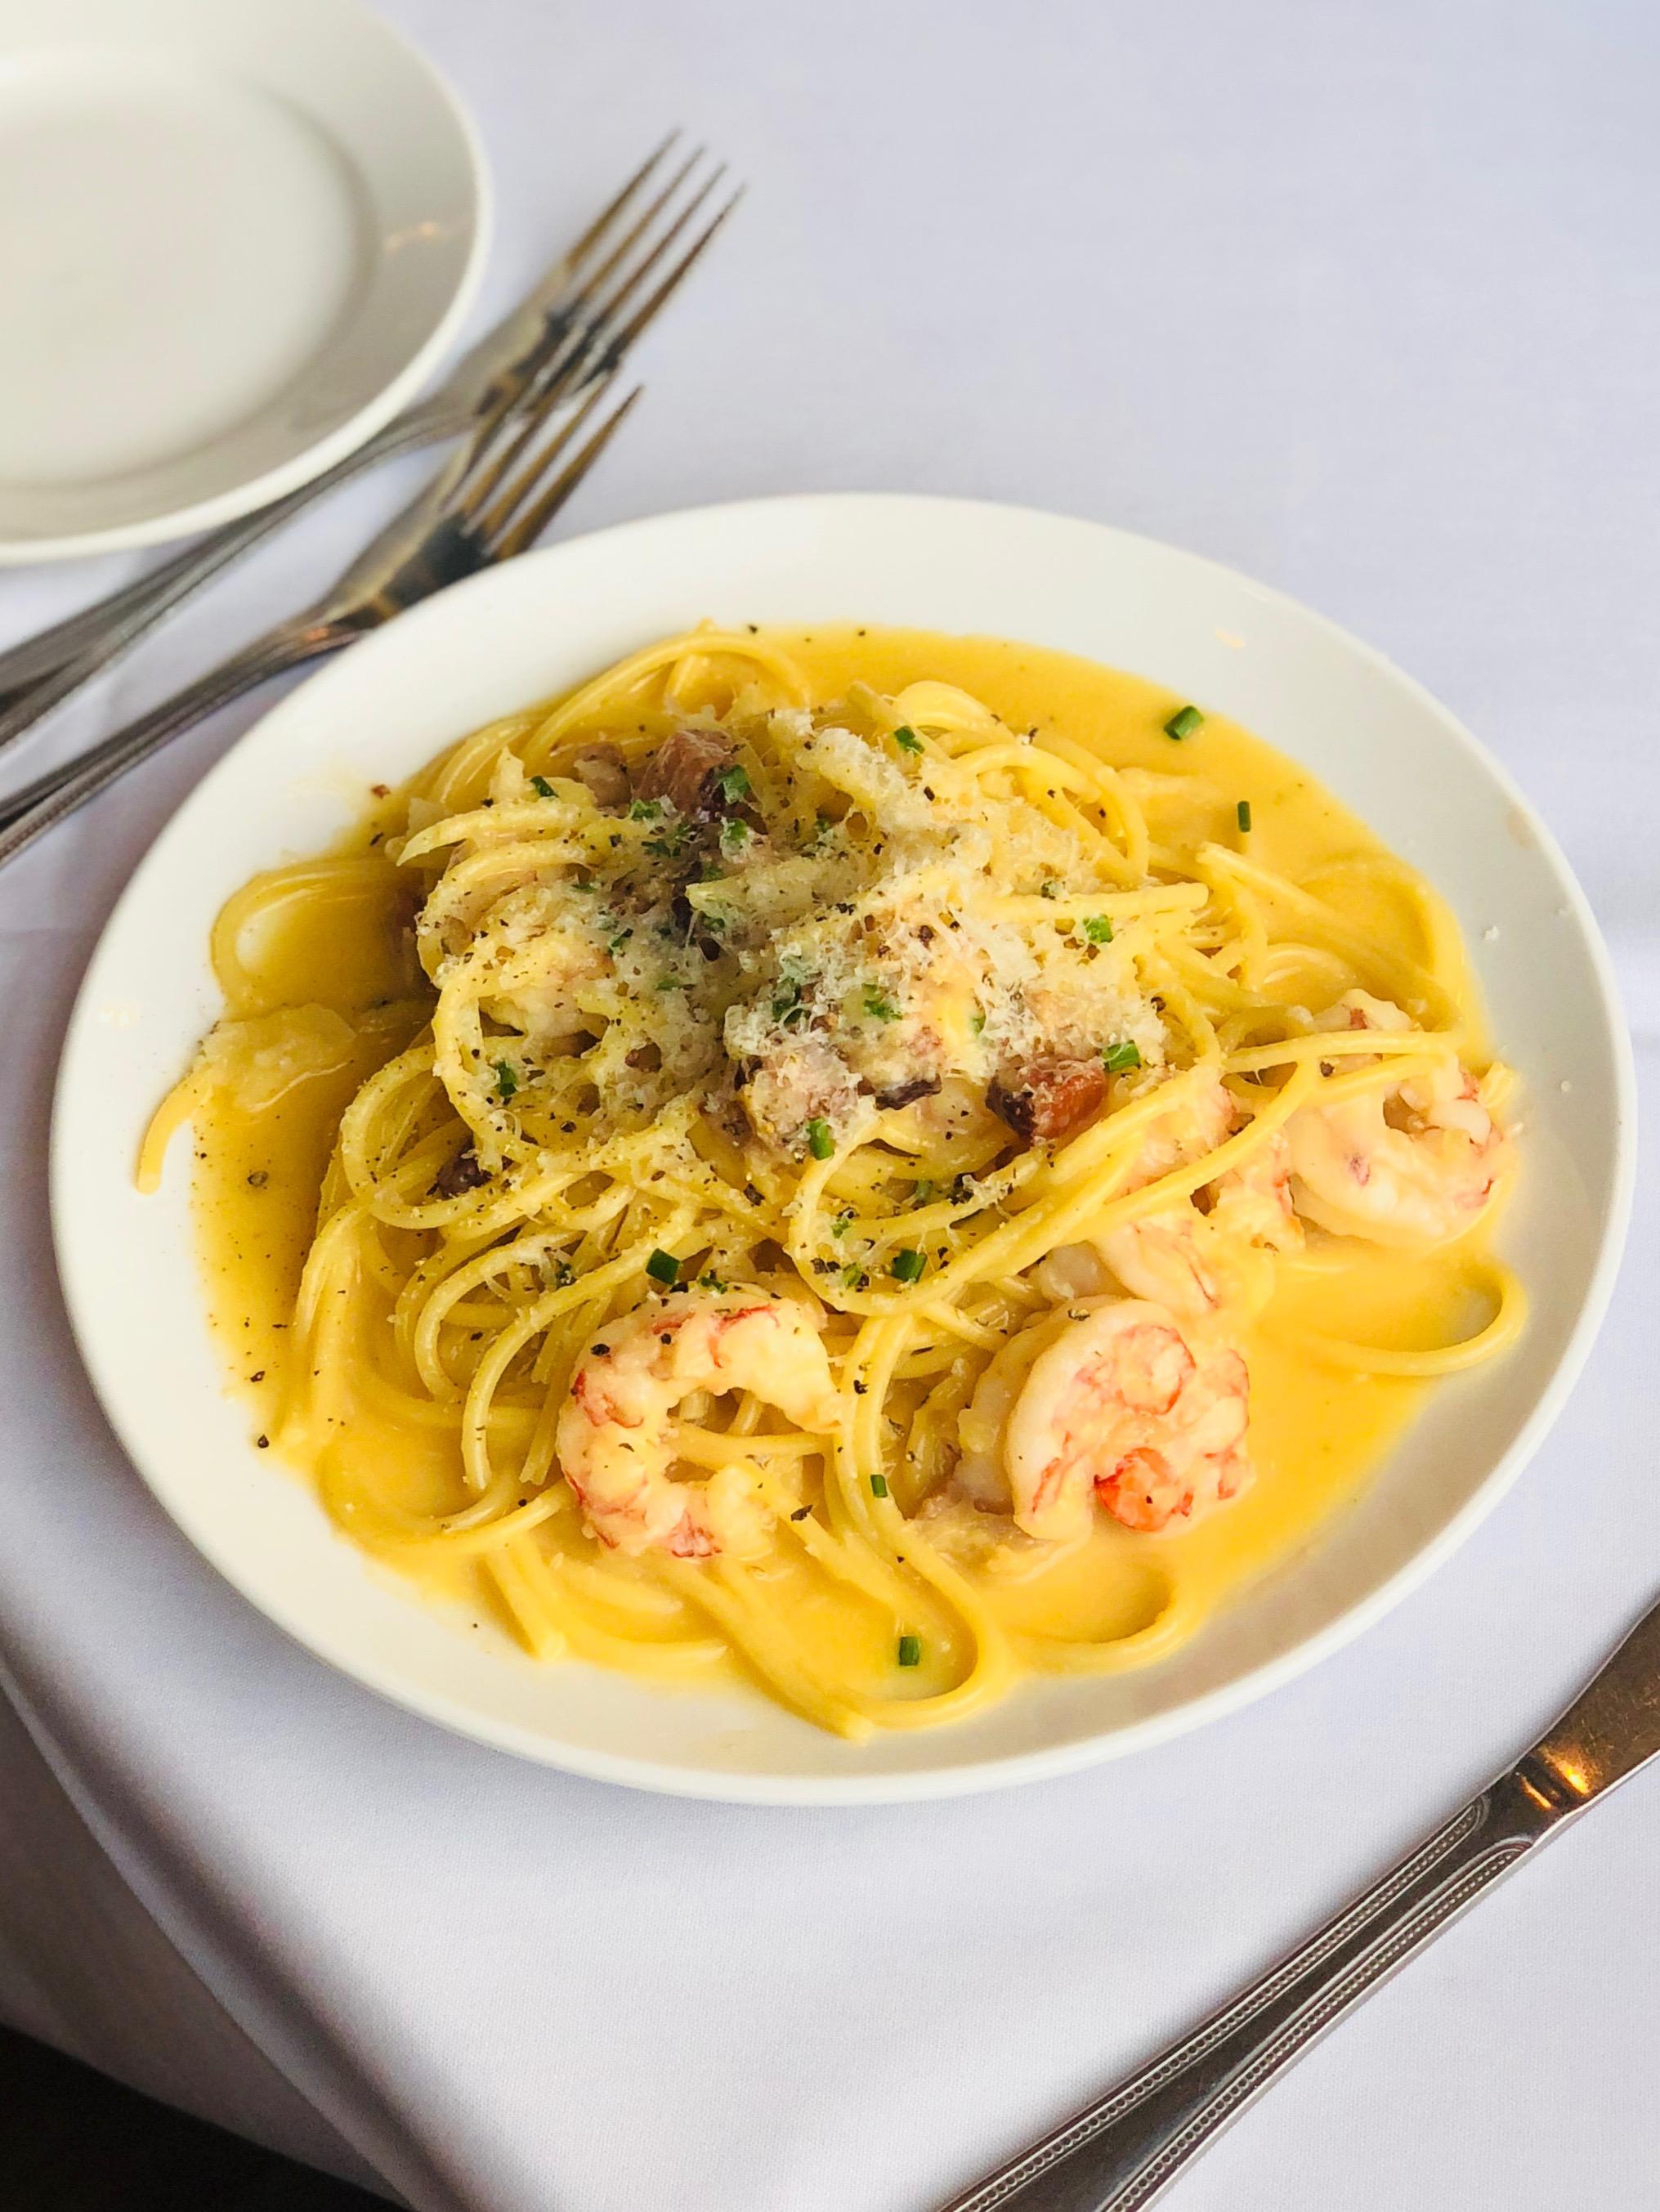 Shrimp Carbonara - Ruby Red Shrimp & Crispy Smoked Appel Belly Tossed in Creamy Pecorino Romano